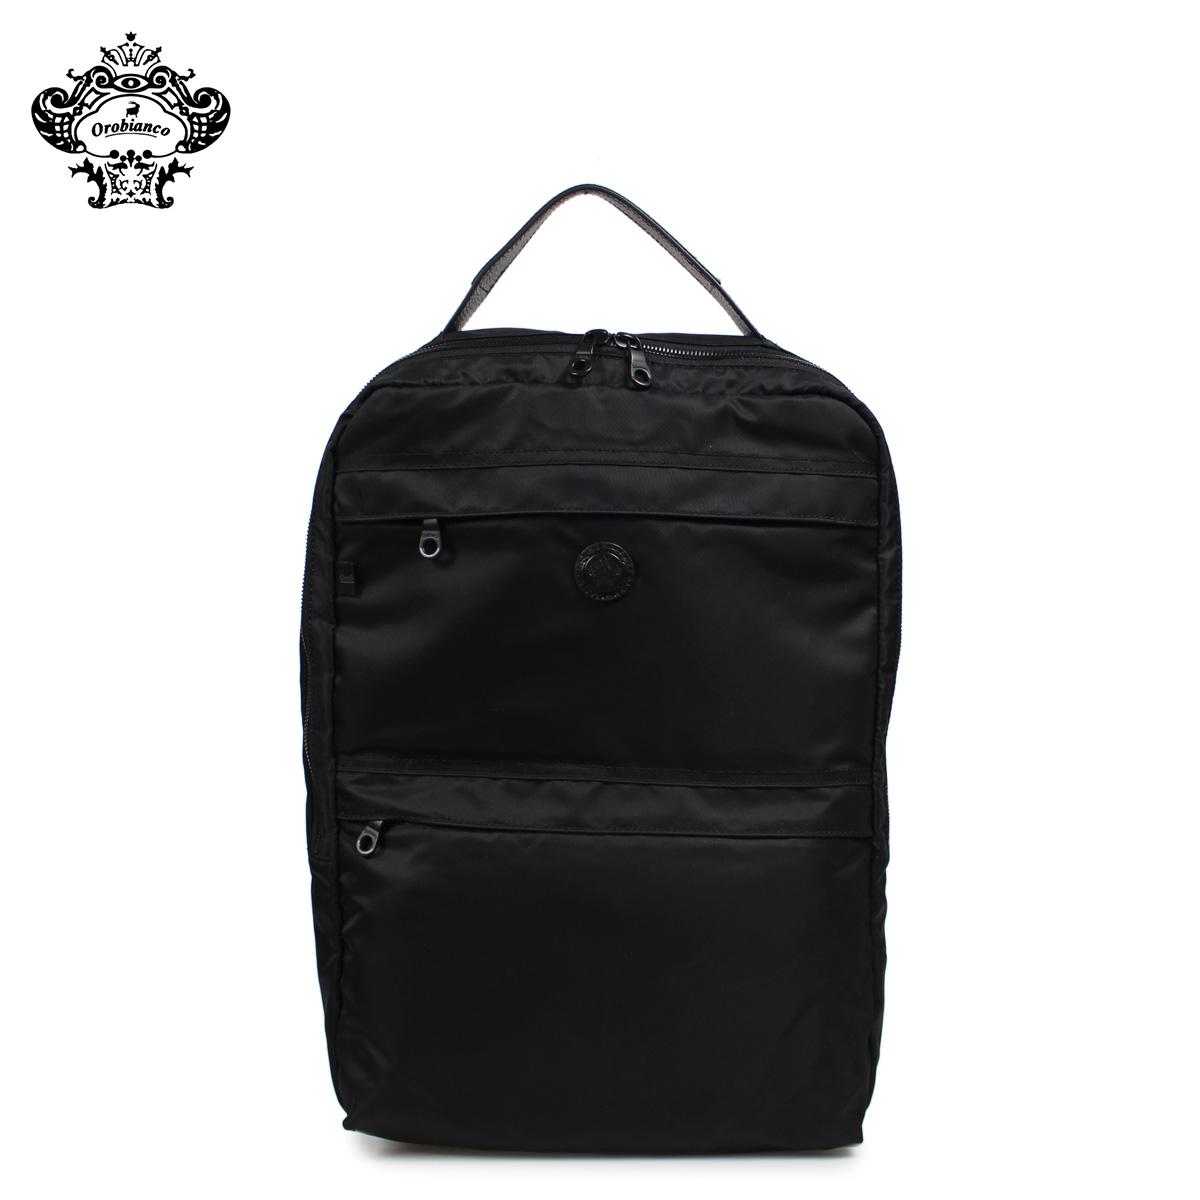 Orobianco オロビアンコ リュック バッグ バックパック メンズ PUNTUALE-G ALL BLACK ブラック 黒 92136